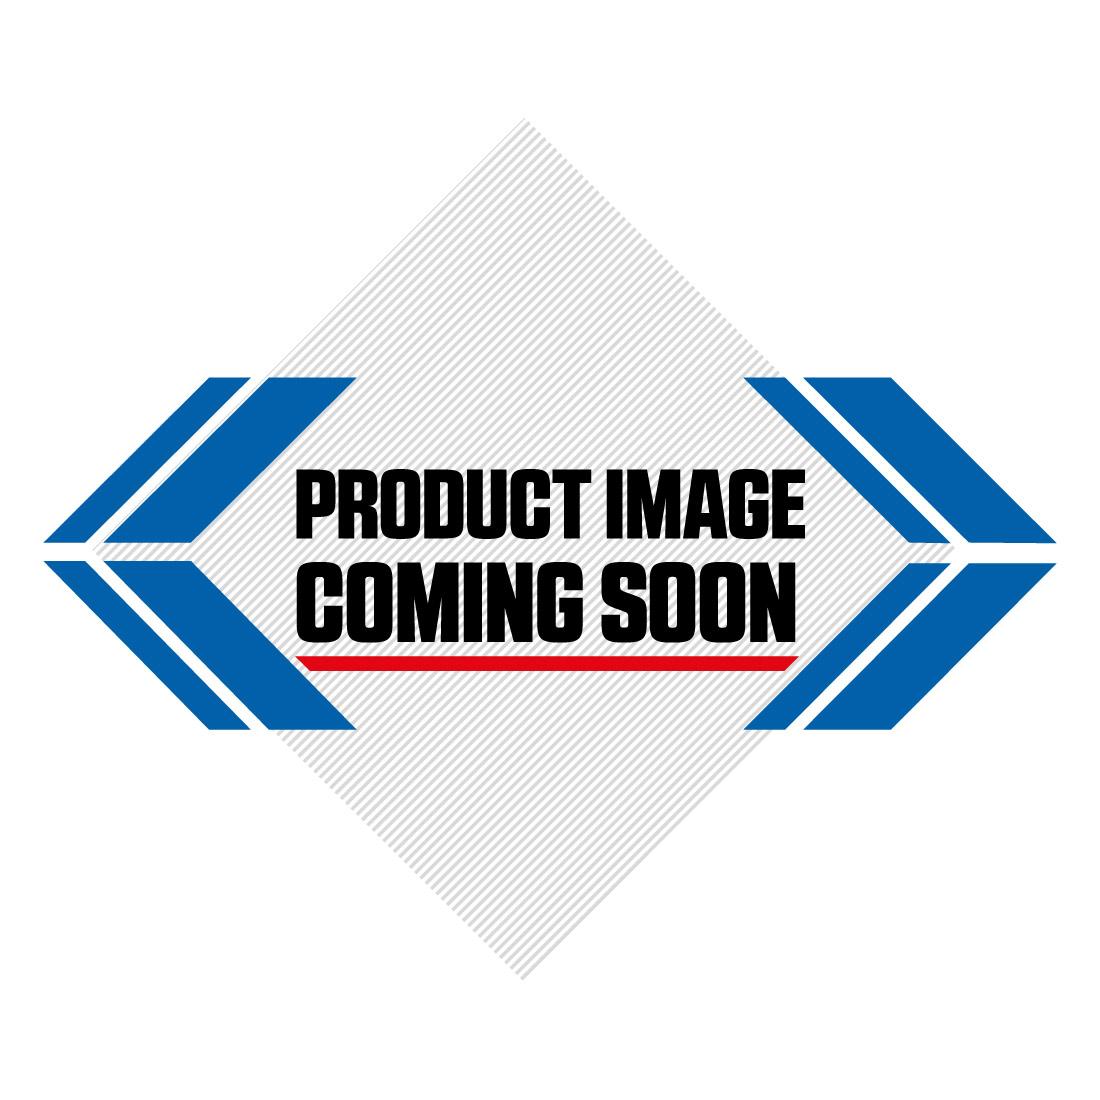 Suzuki Plastic Kit RMZ 450 (08-17) OEM Factory Image-4